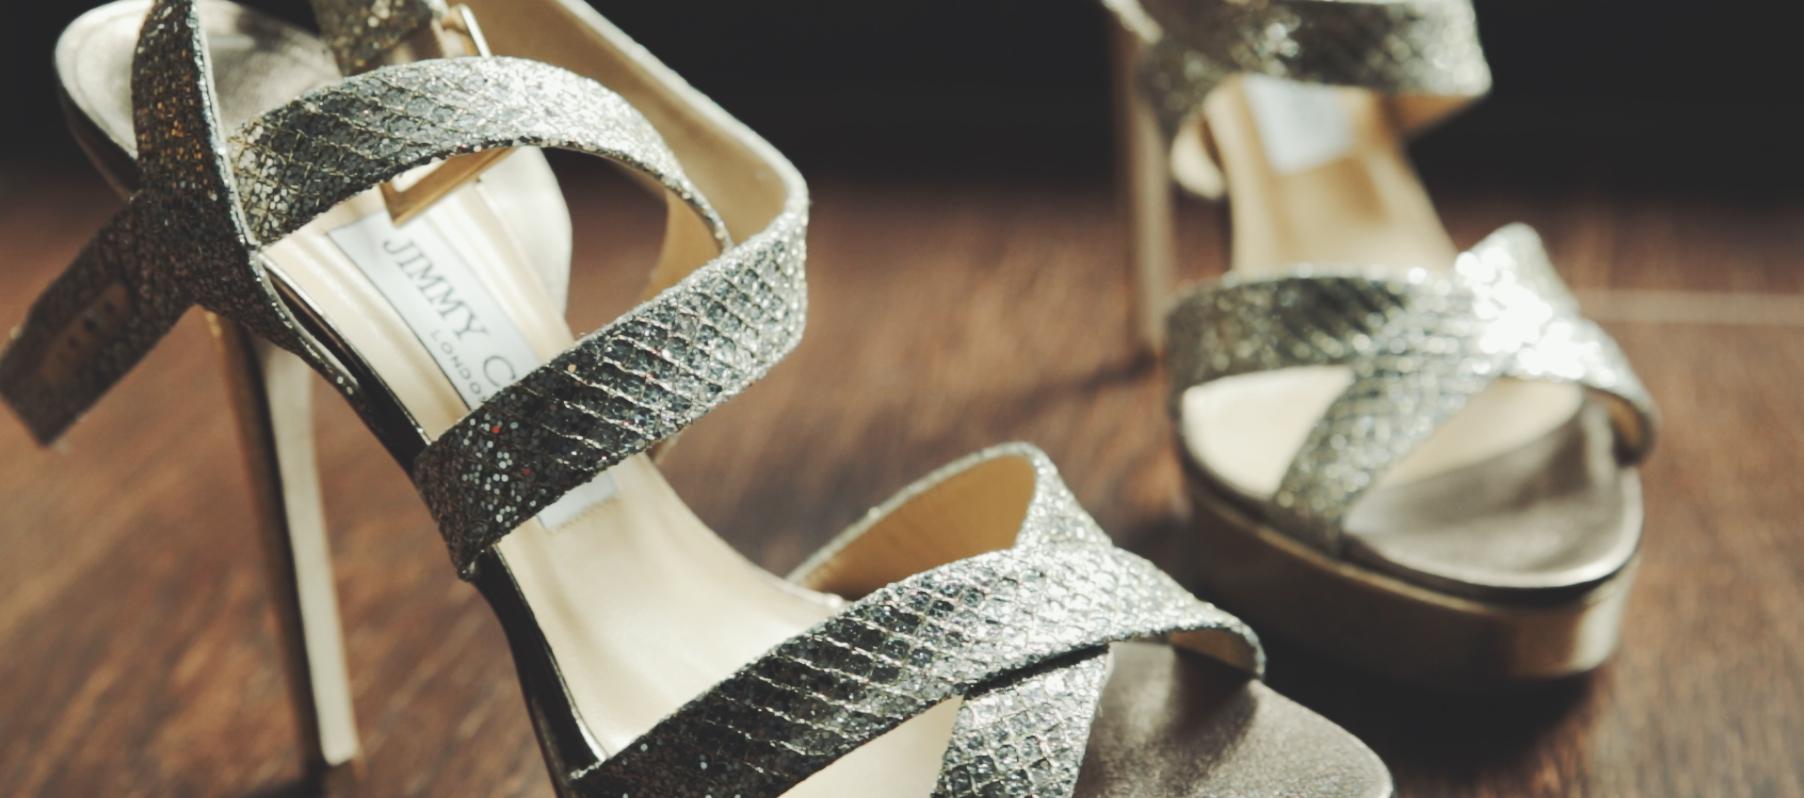 zapatos-natalia-para-portada-nueva-teamoati